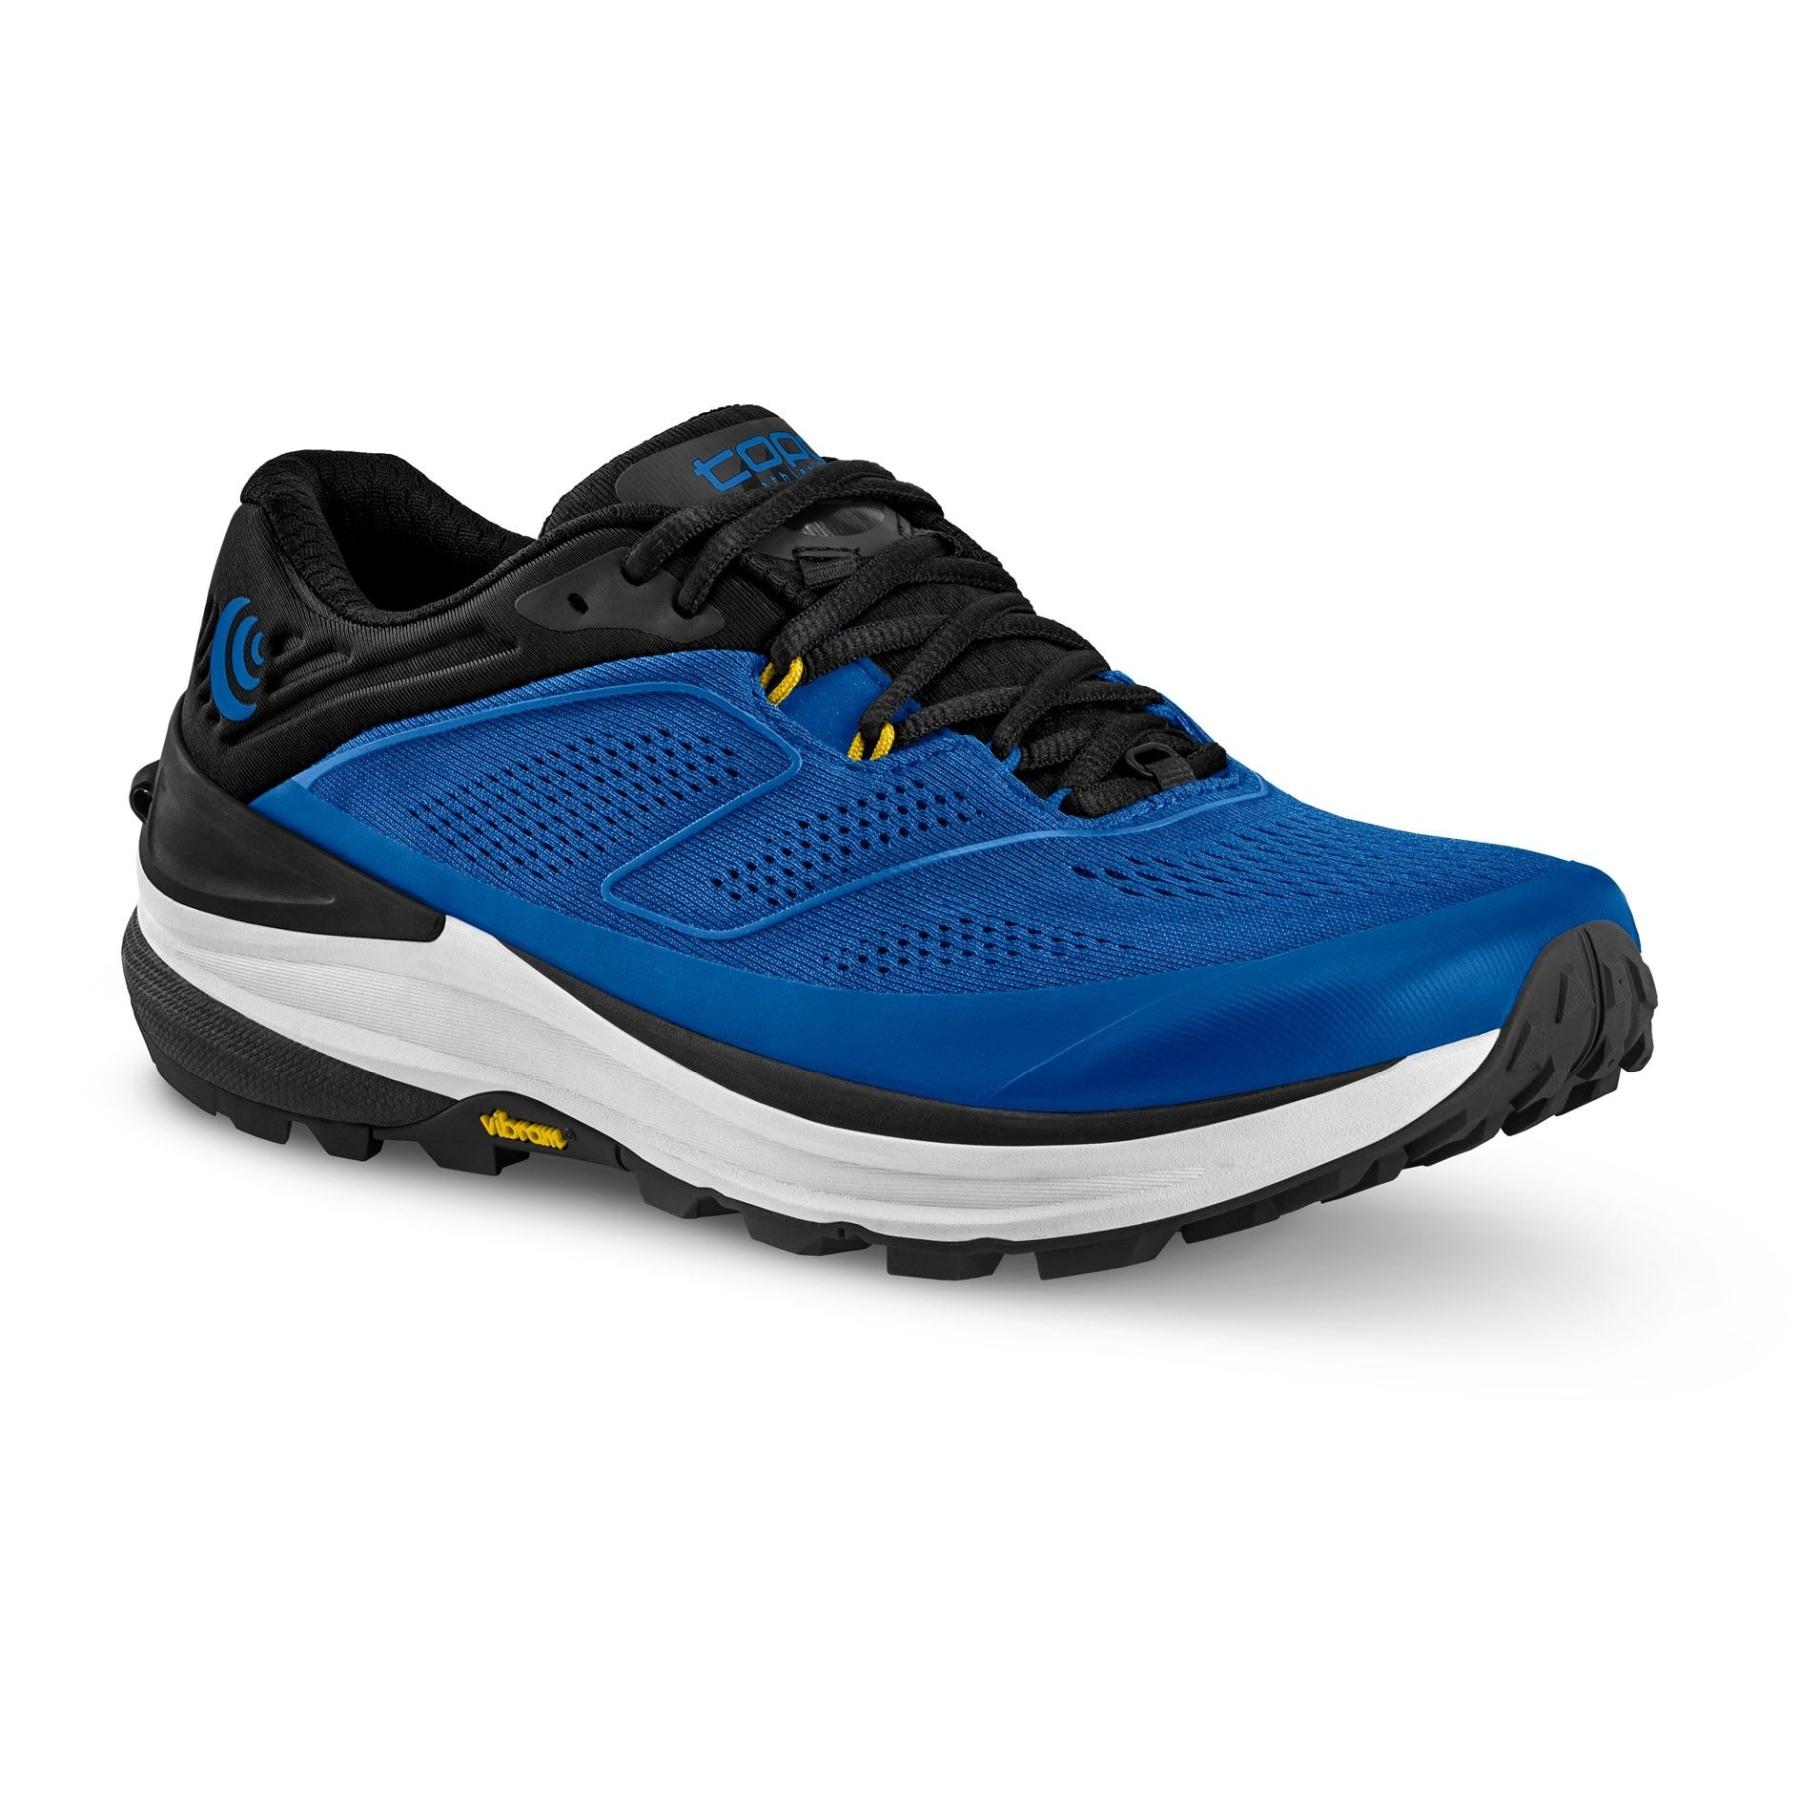 Topo Athletic Ultraventure 2 Trail Laufschuhe - blue/grey